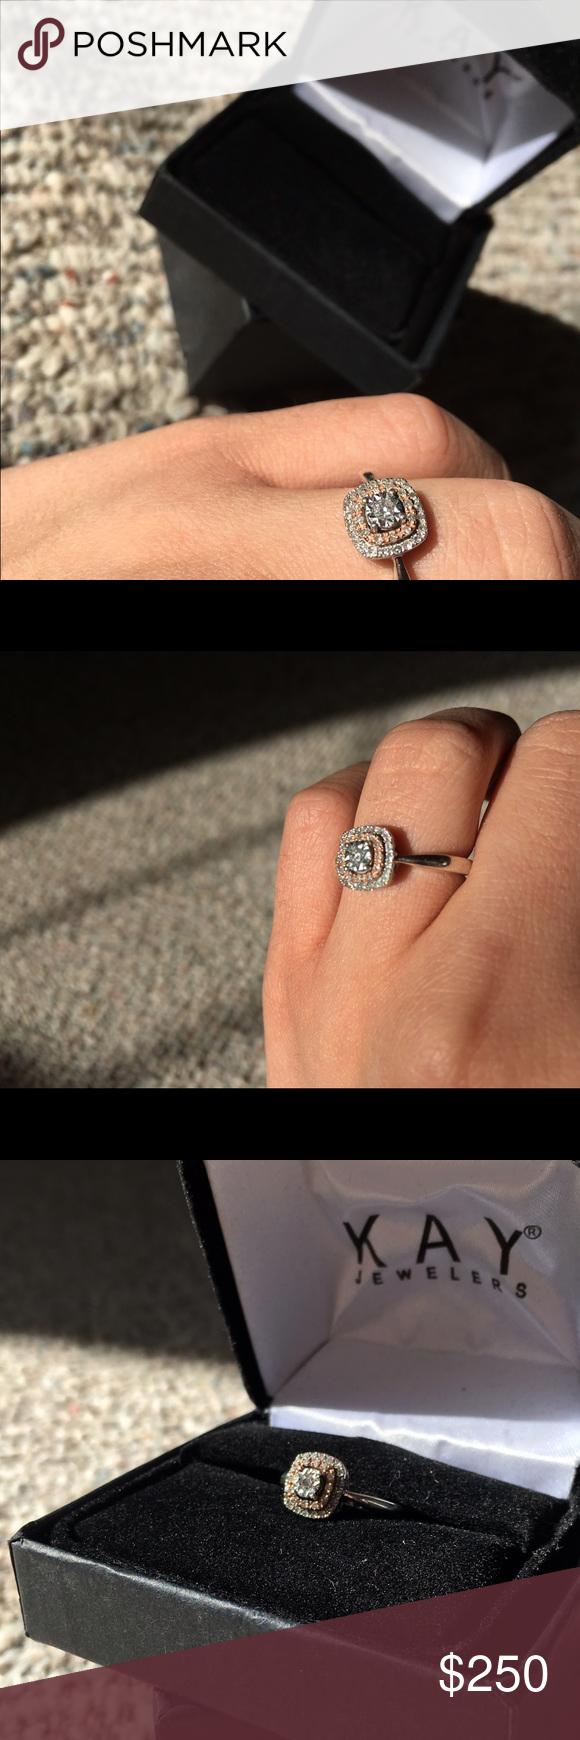 Kay Jewelers Ssil Fashion Diamond Ring Silver Rose Gold 10k And 1 5 K Diamond Fashion Halo Kay Jewelers Je Diamond Fashion Rings Kay Jewelers Diamond Fashion